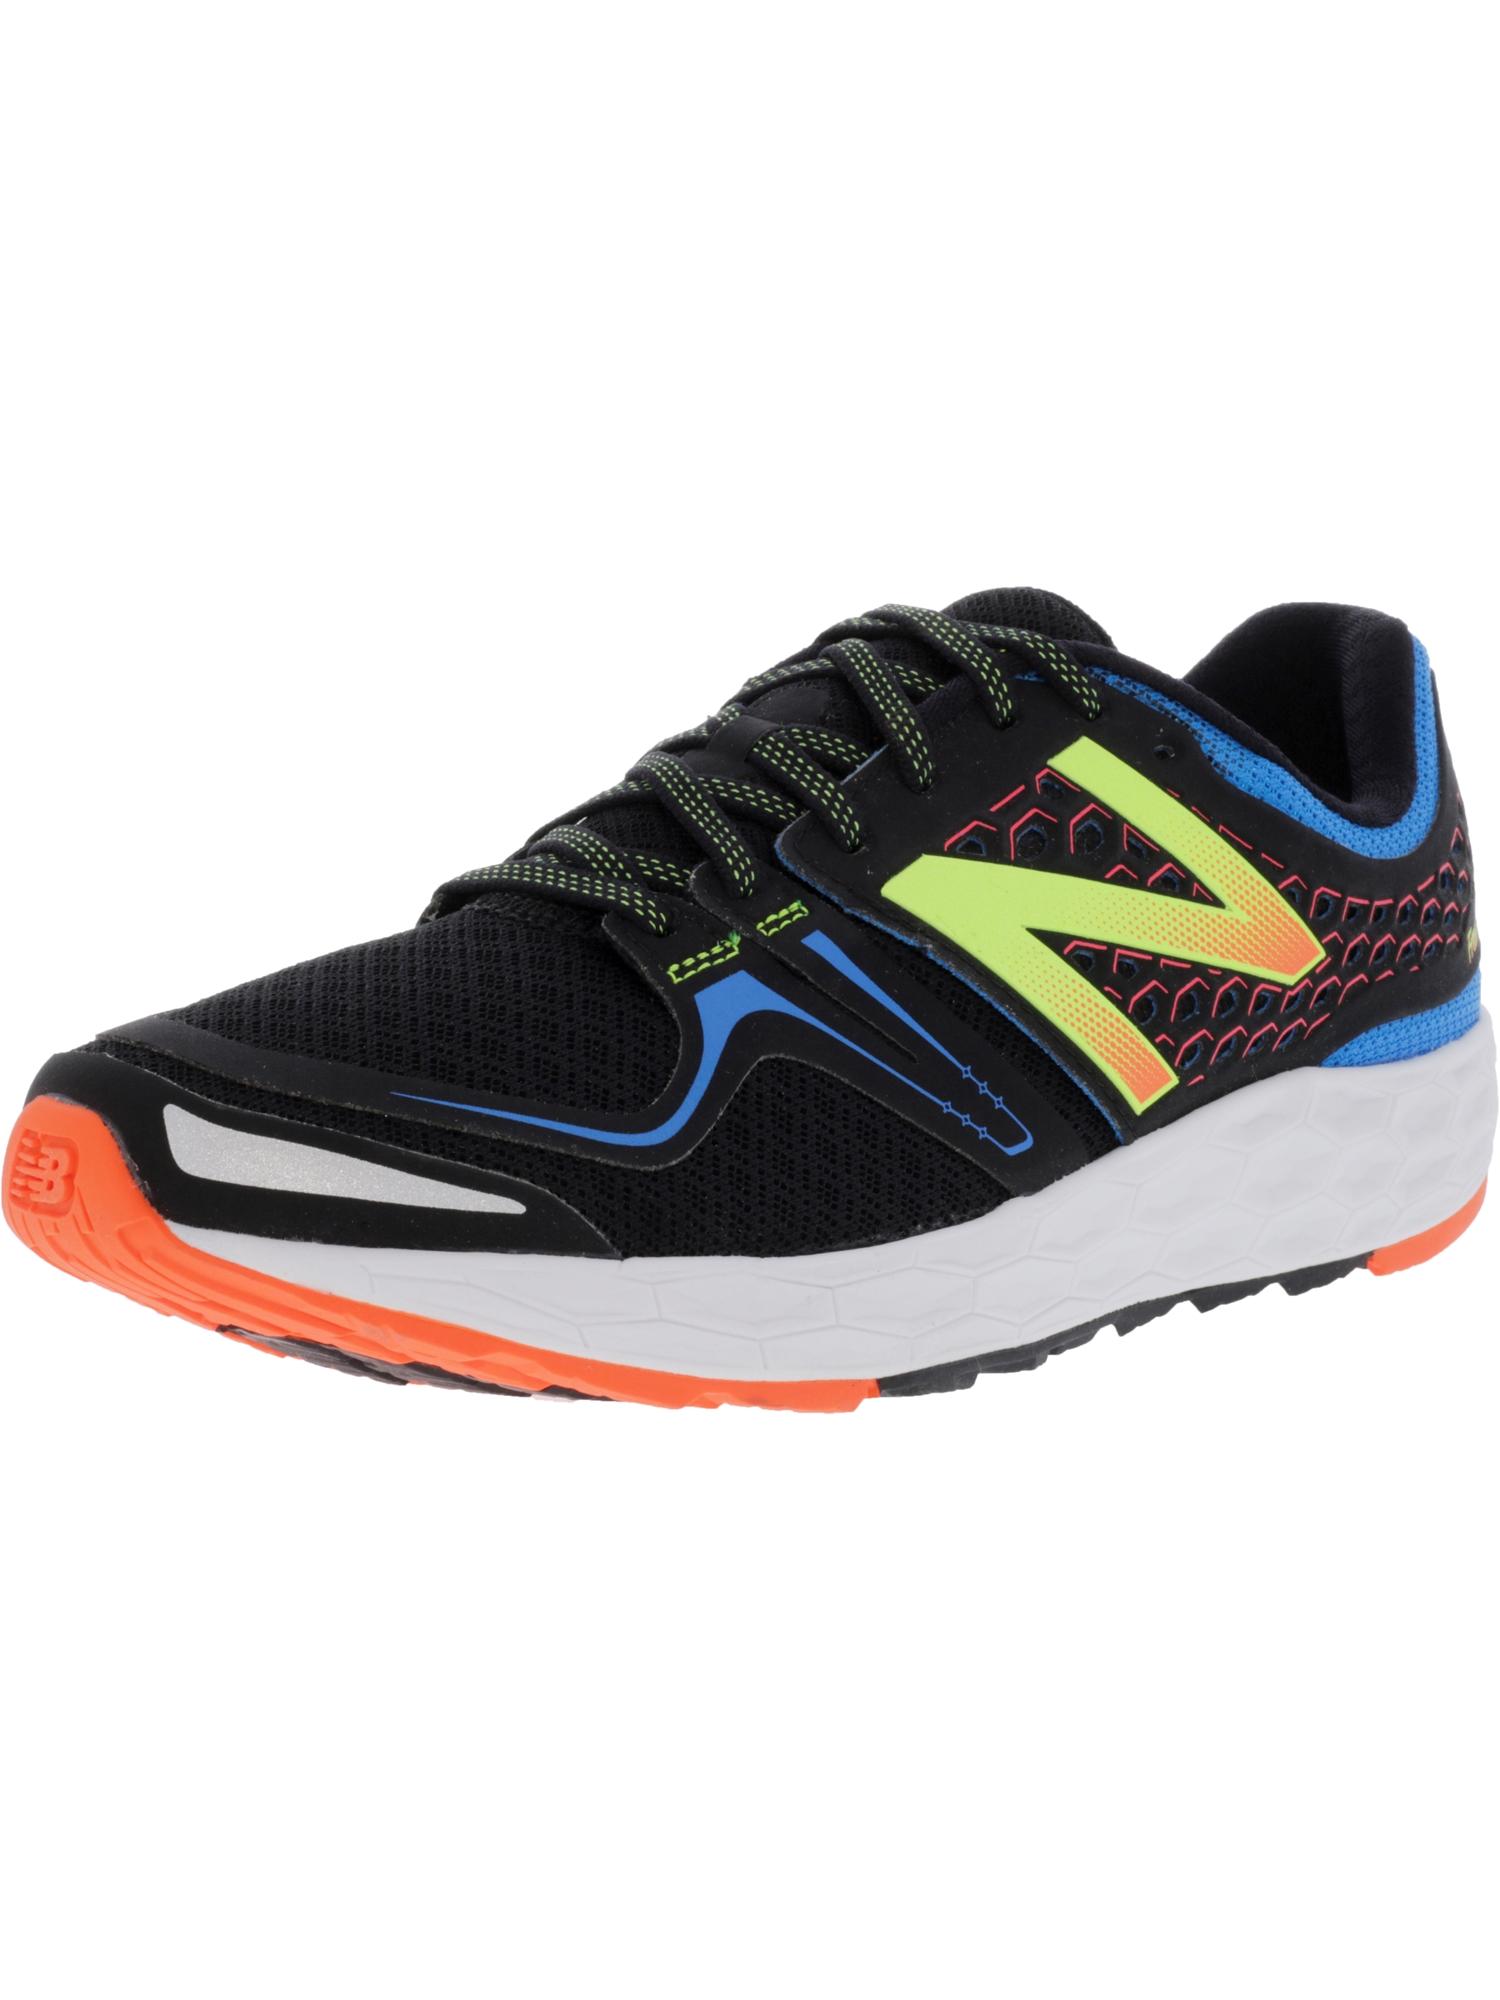 New Balance Men's Mvngo Bb Ankle-High Running Shoe - 7W